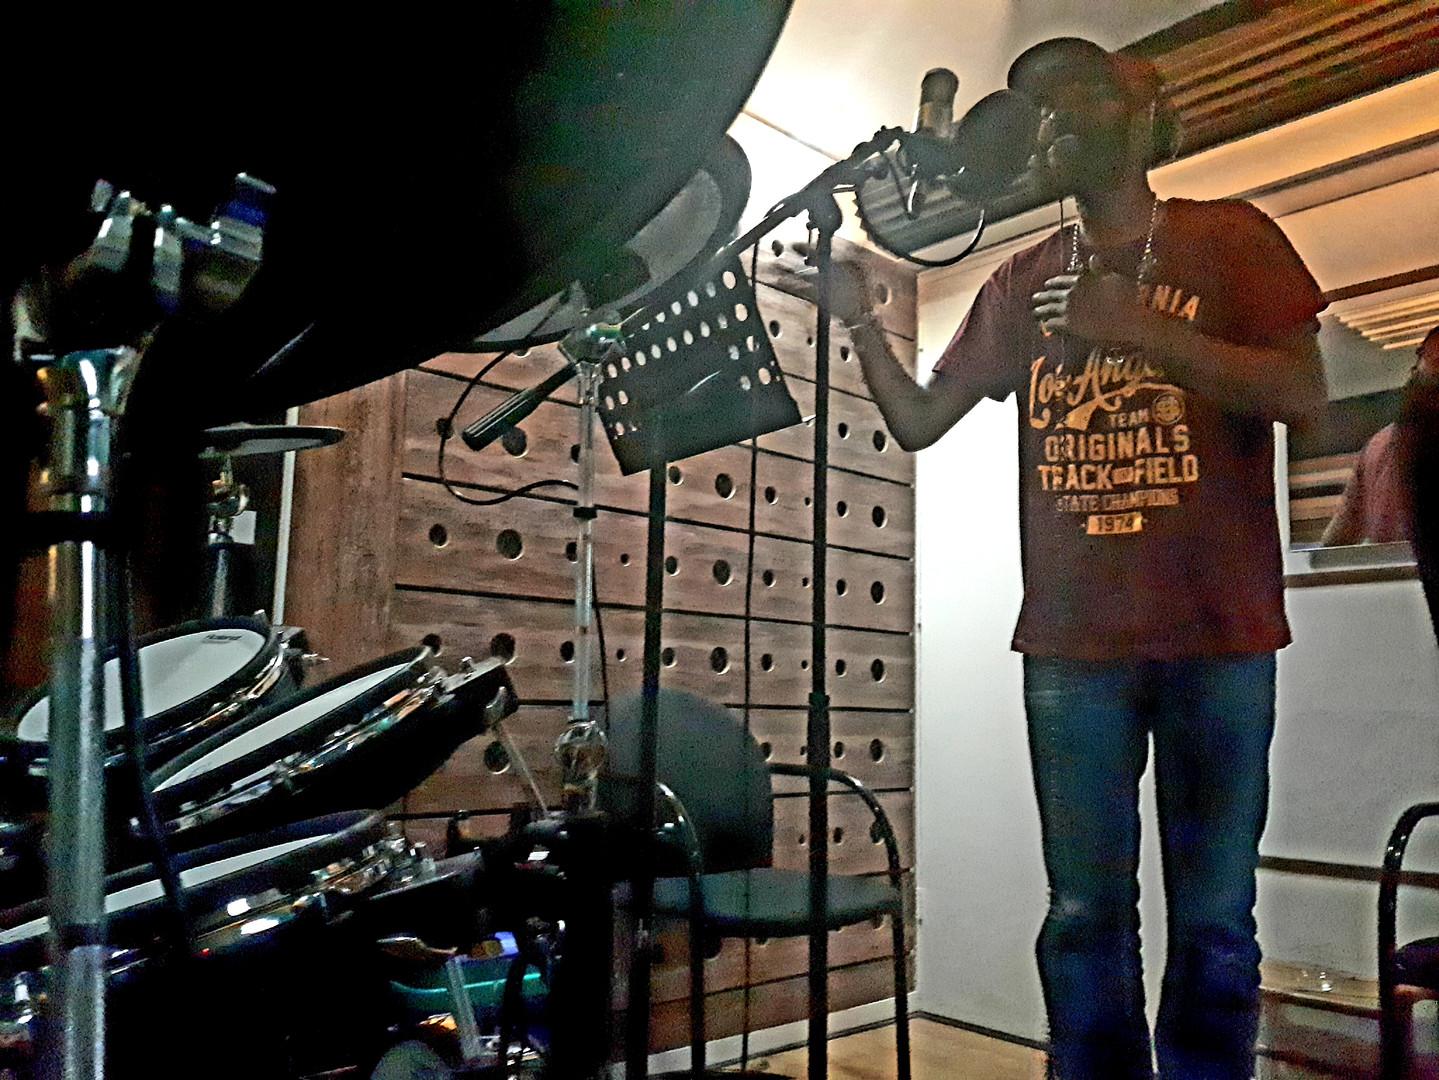 Chantalot - Independart Studio session